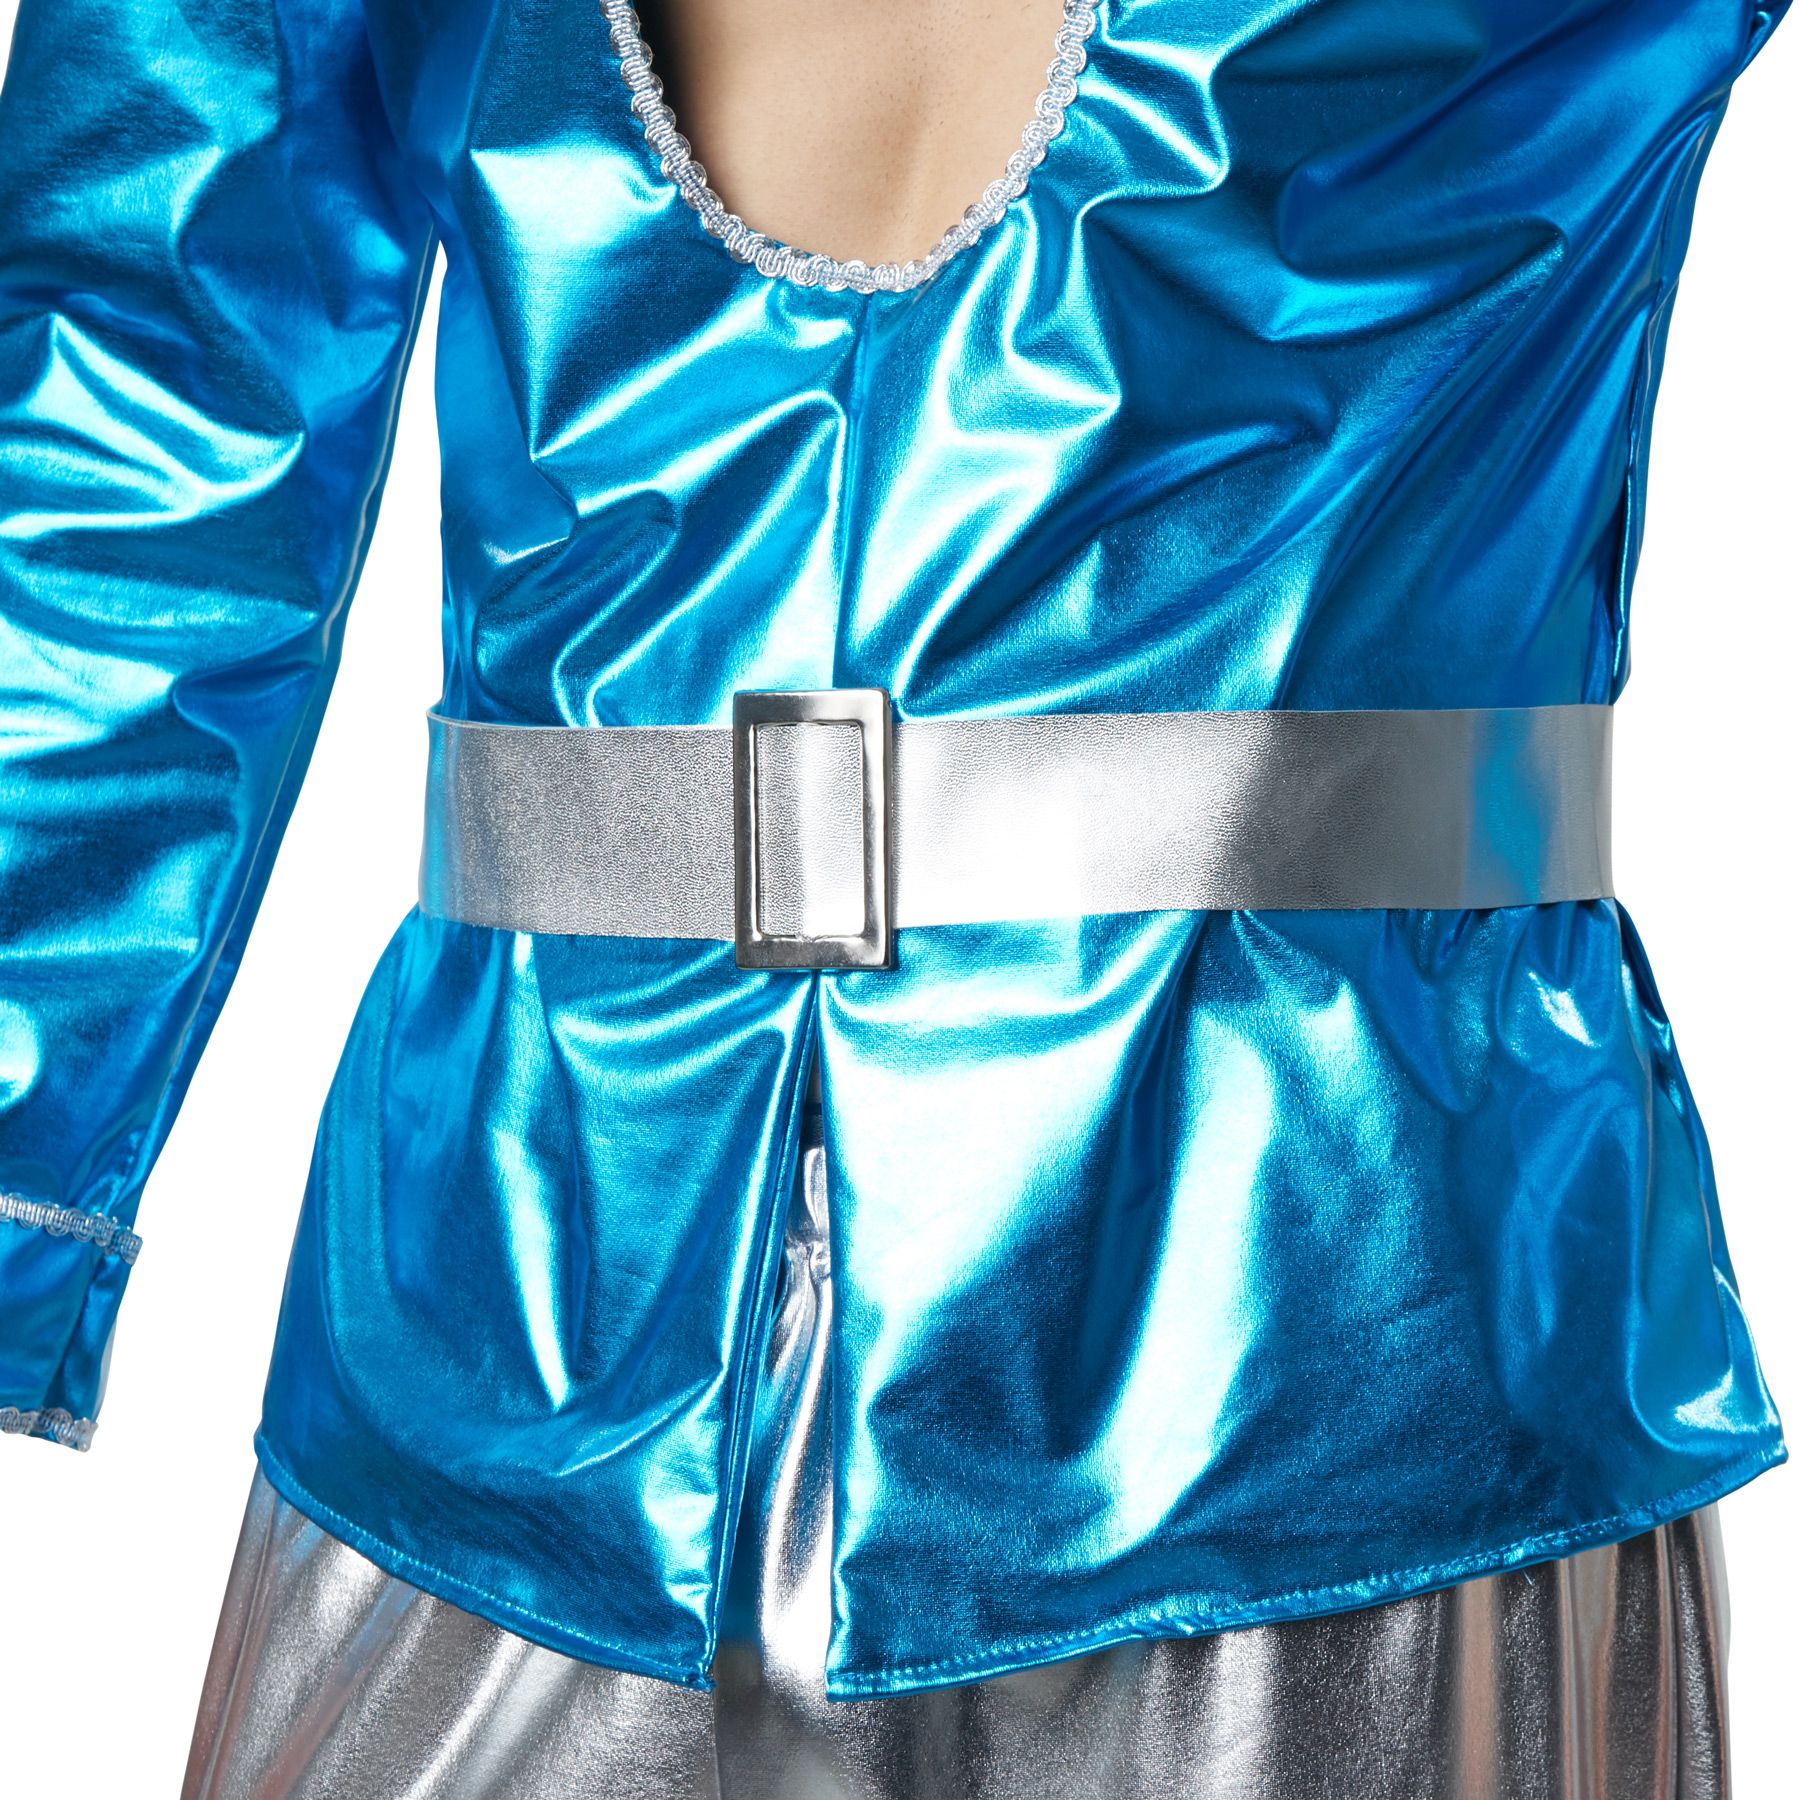 Costume Steelman24 Ragazzo